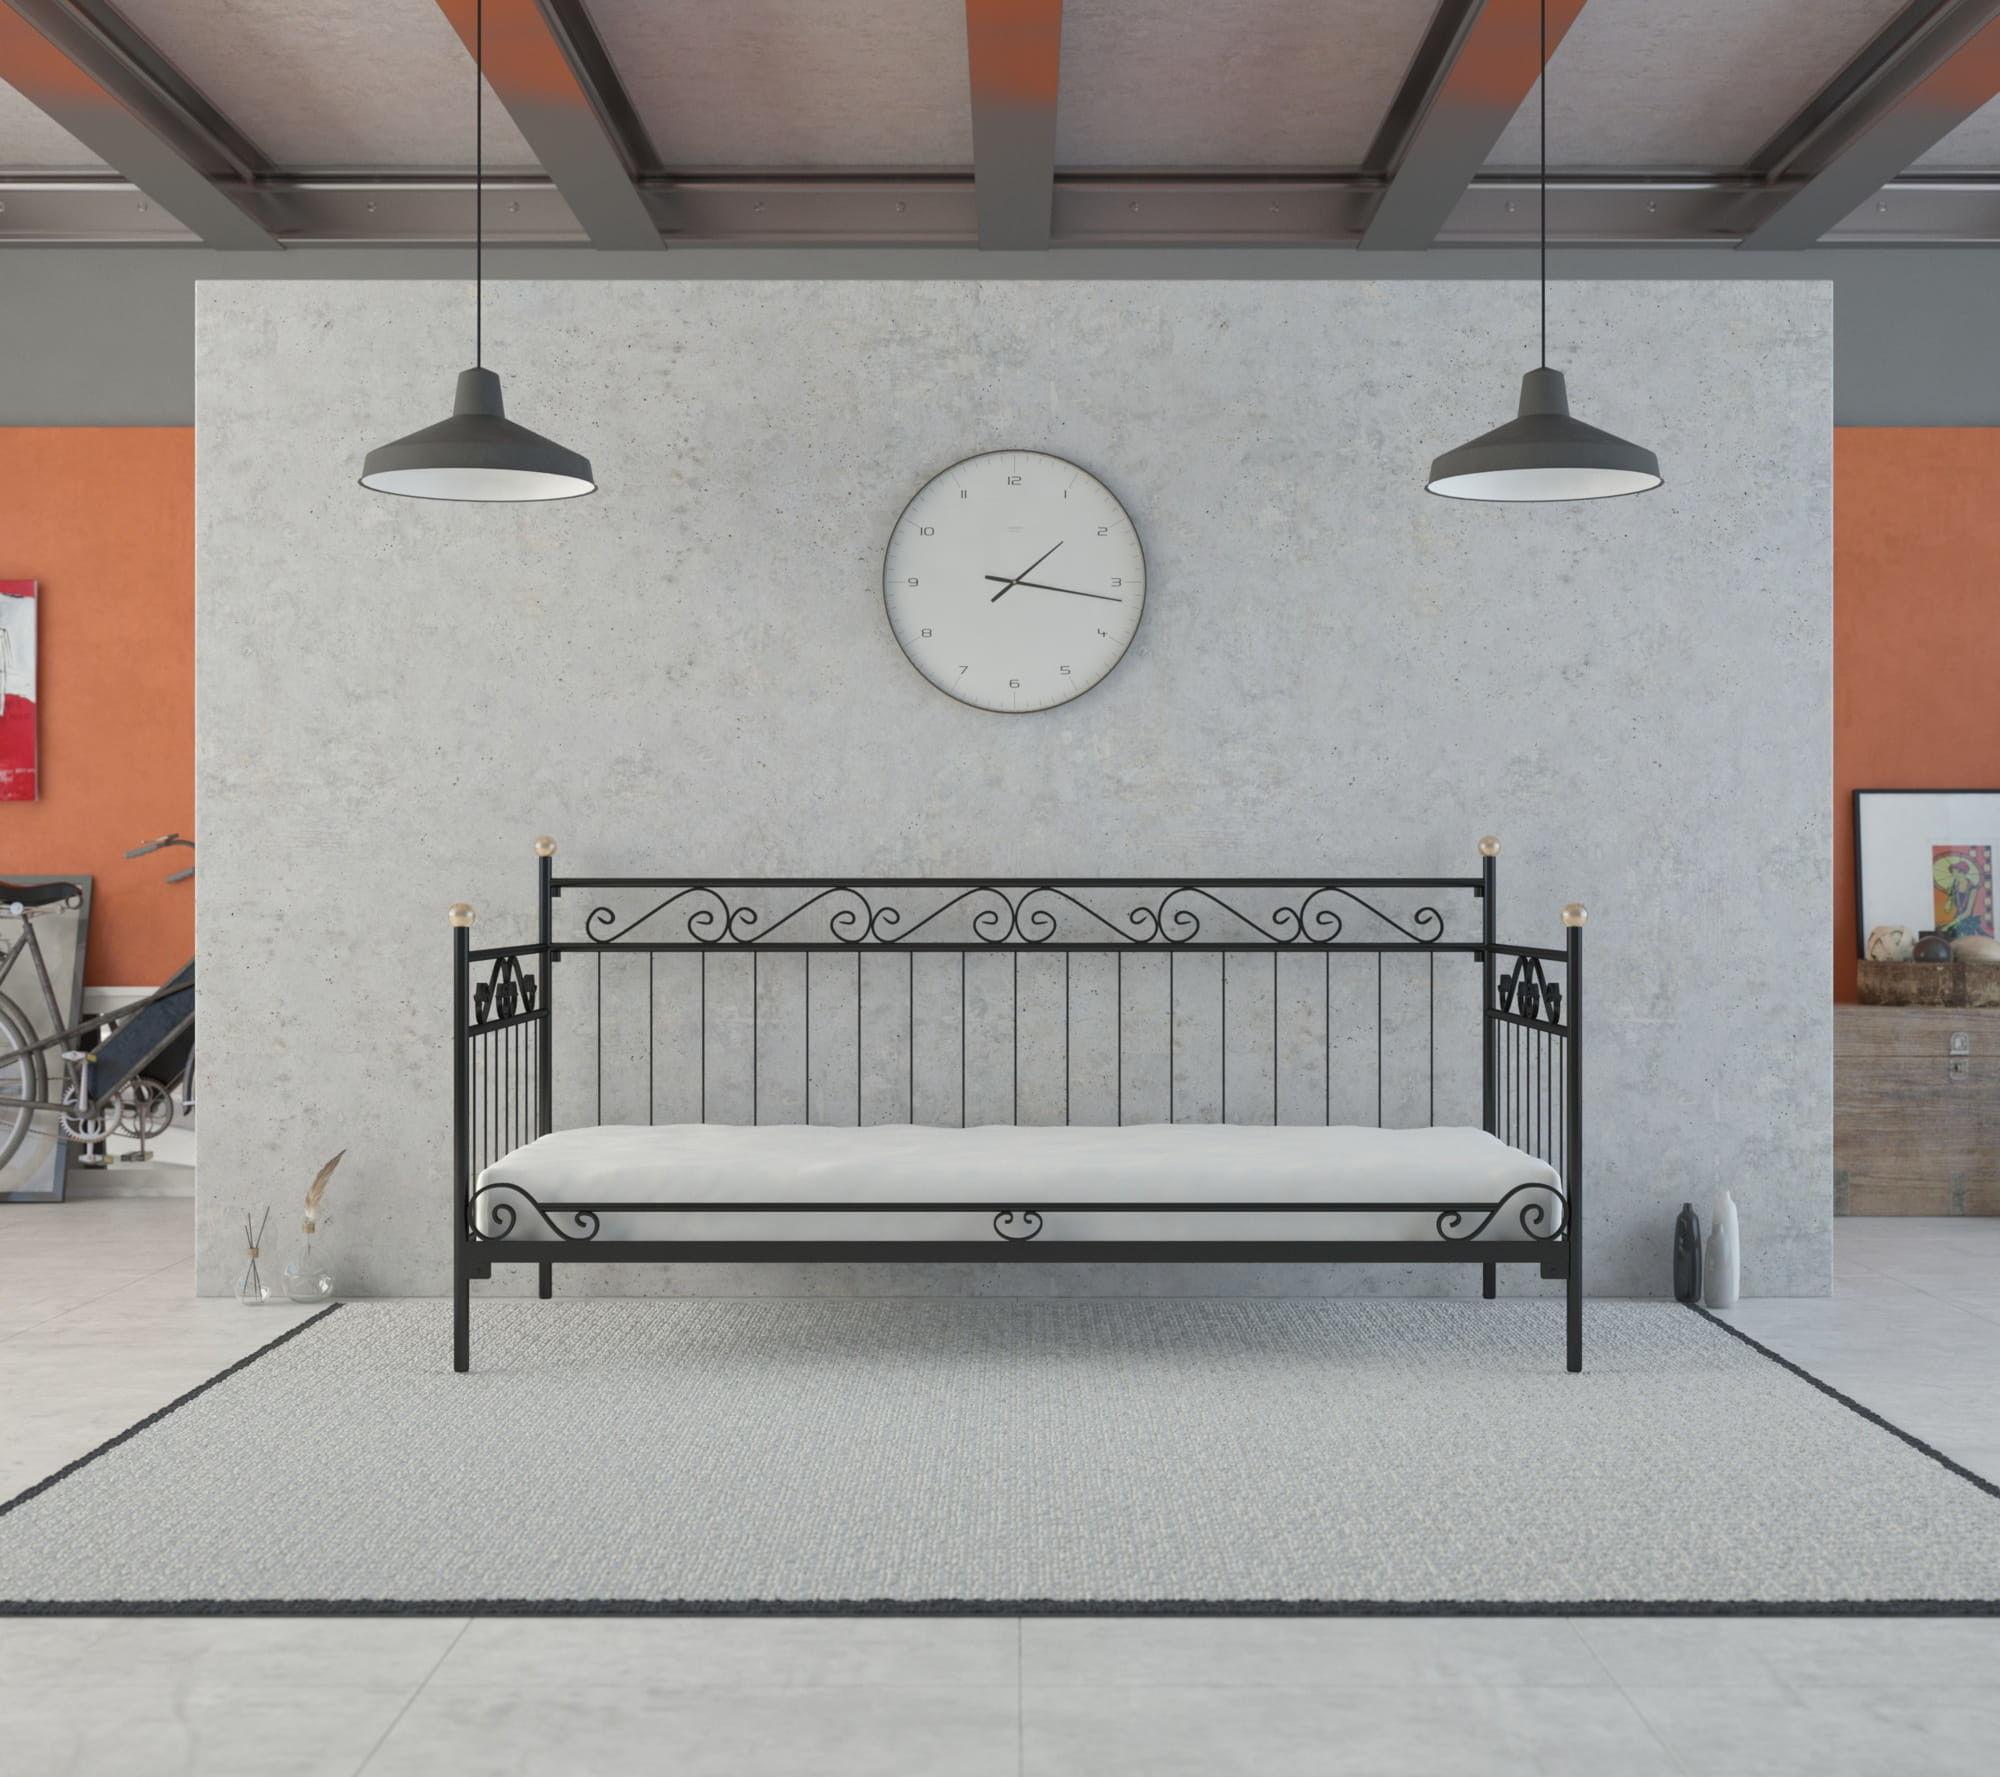 Sofa ogrodowa Lak System wzór 30